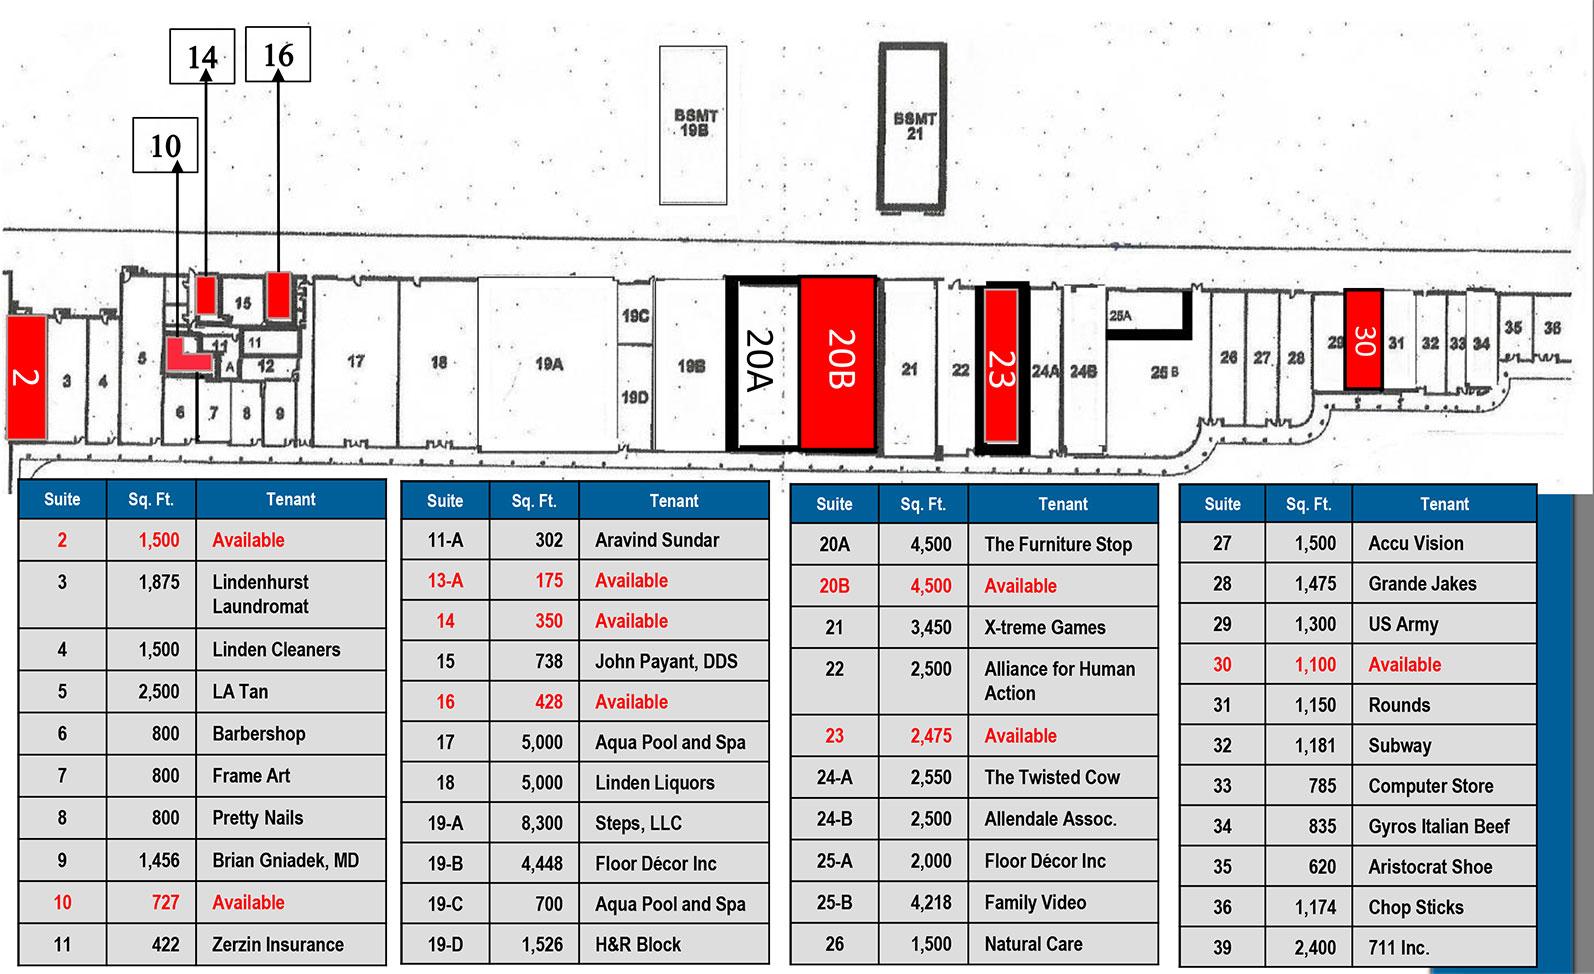 Linden Plaza site plan - Linden Plaza